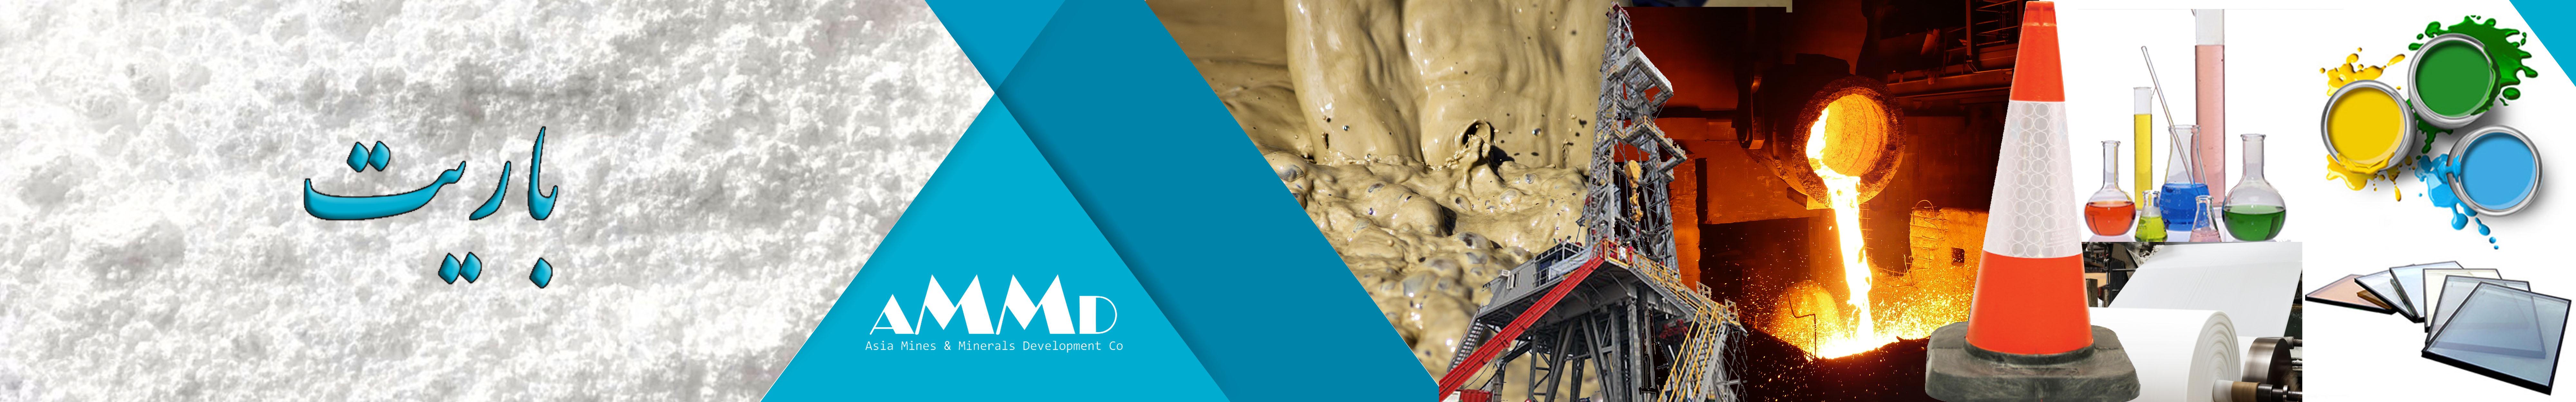 barite پودر باریت حفاری باریت کریستال باریت رنگ سازی باریت ریخته گری و متالورژی فروش باریت معدن باریت صادرات باریت کلوخه باریت